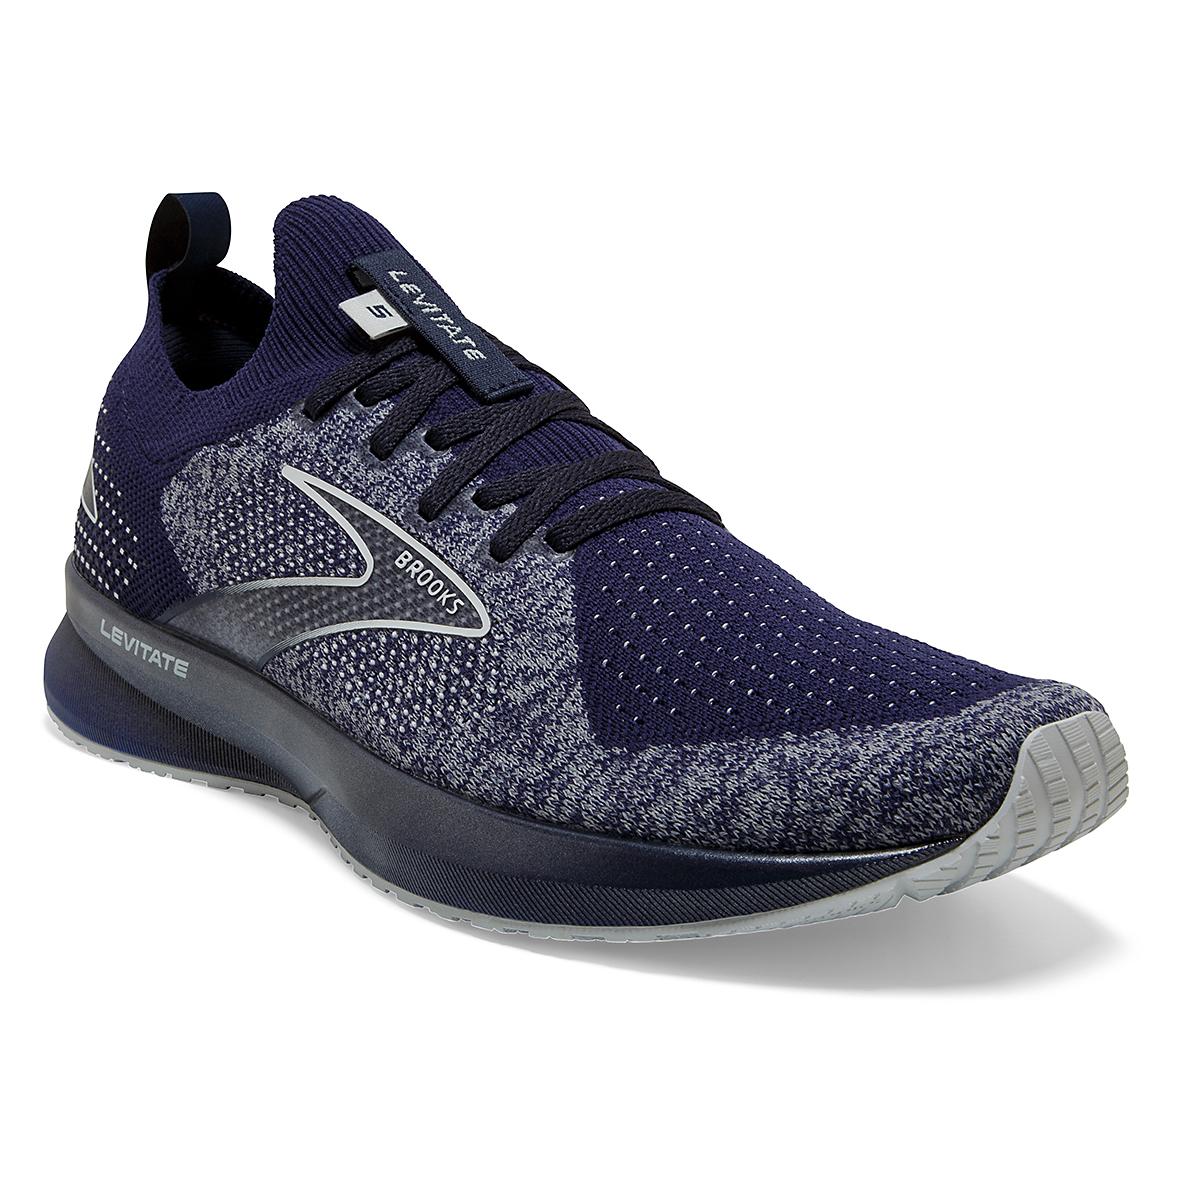 Men's Brooks Levitate Stealthfit 5 Running Shoe - Color: Peacoat/Grey - Size: 7 - Width: Regular, Peacoat/Grey, large, image 2